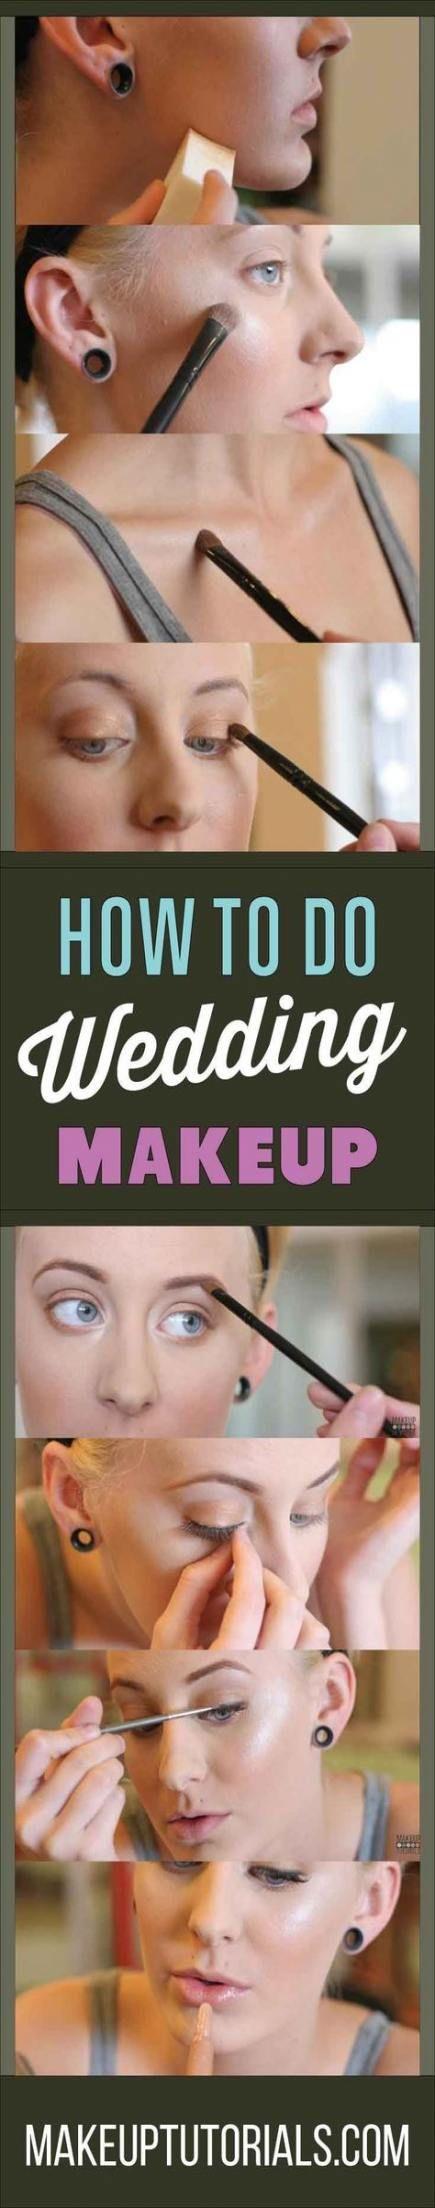 16+ ideas makeup wedding ideas tutorials for 2019